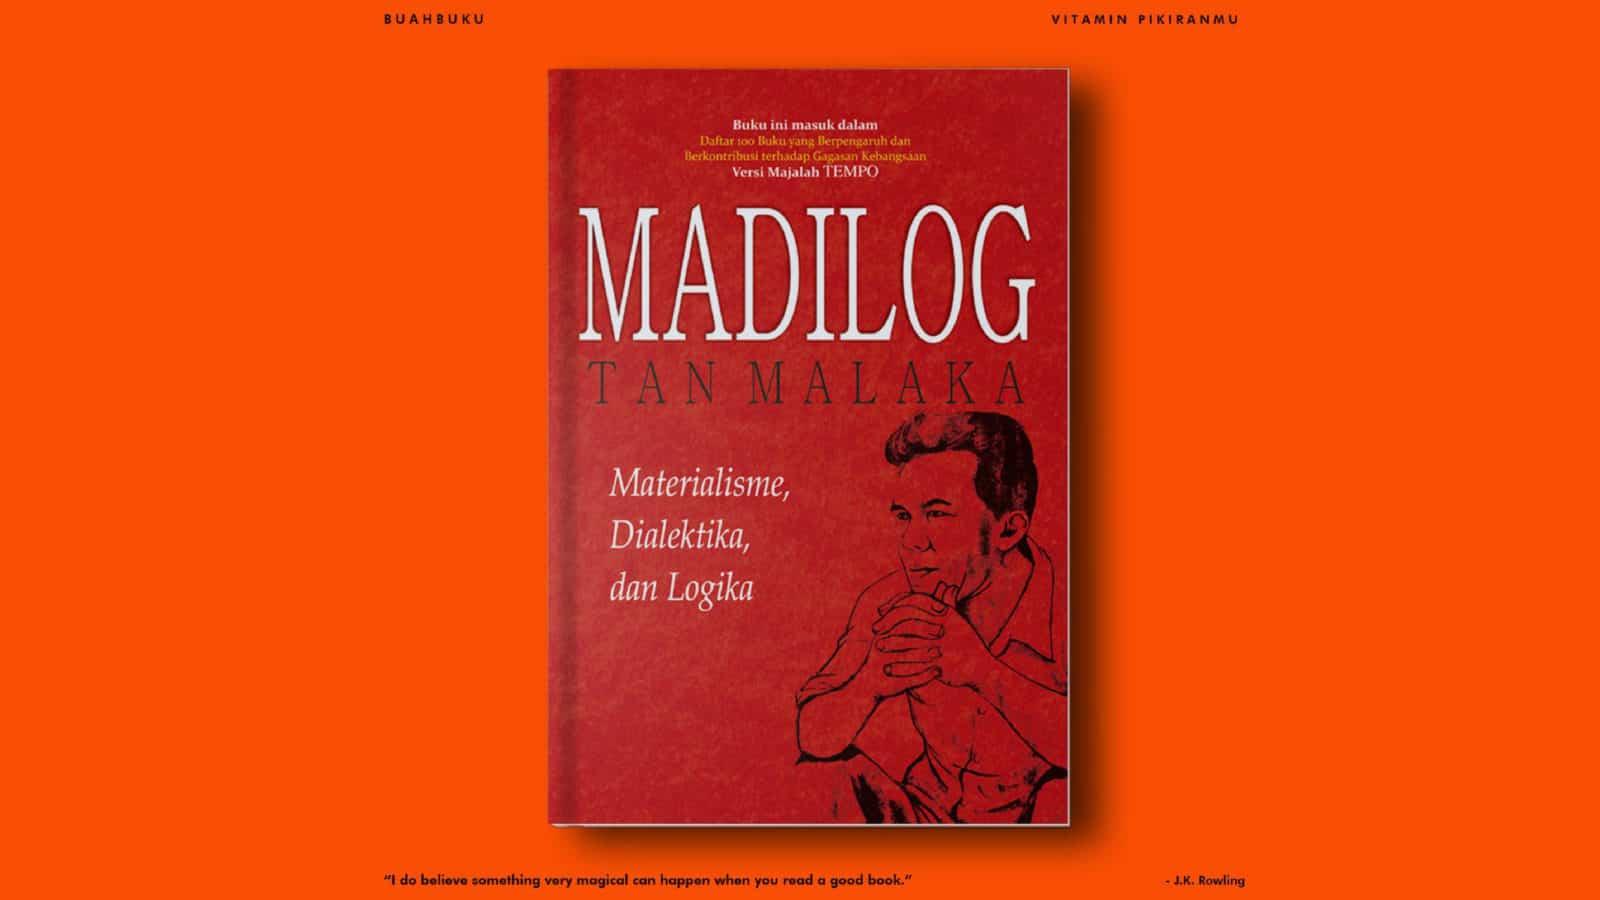 Buku Tan Malaka Madilog